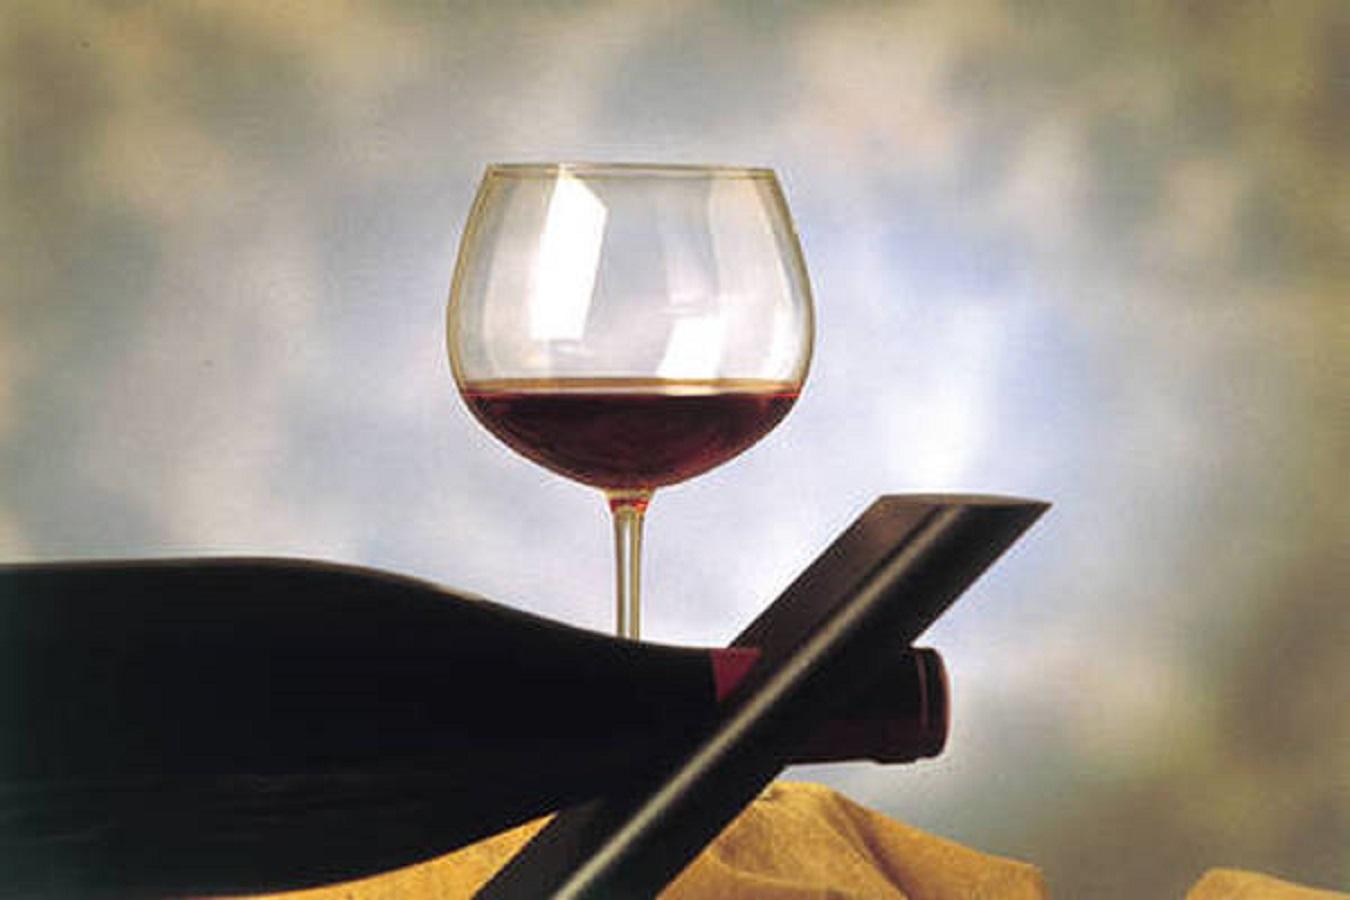 dieta-sana-vino-rosso